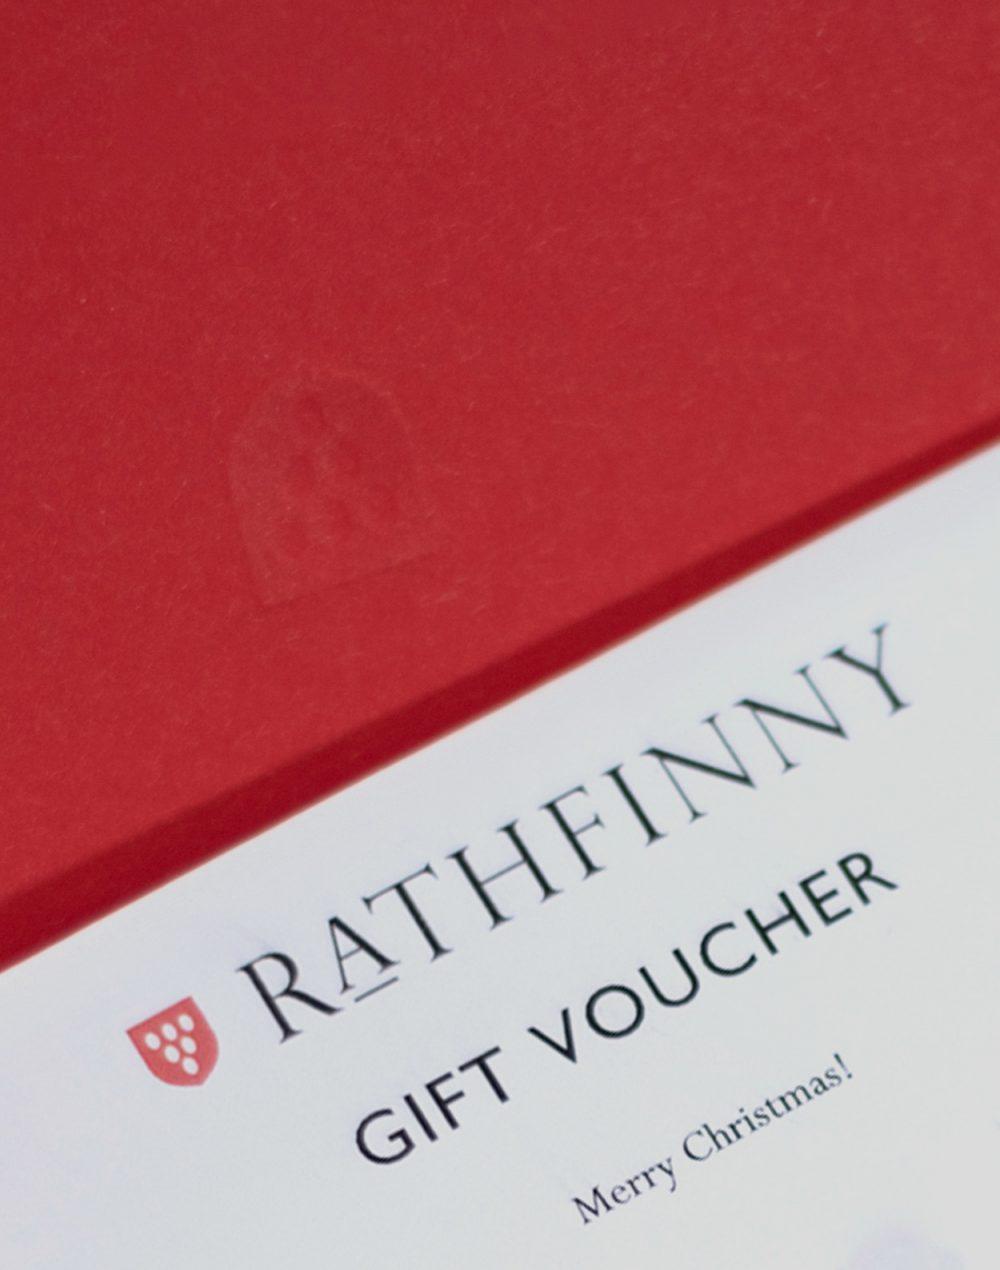 Rathfinny Gift Vouchers